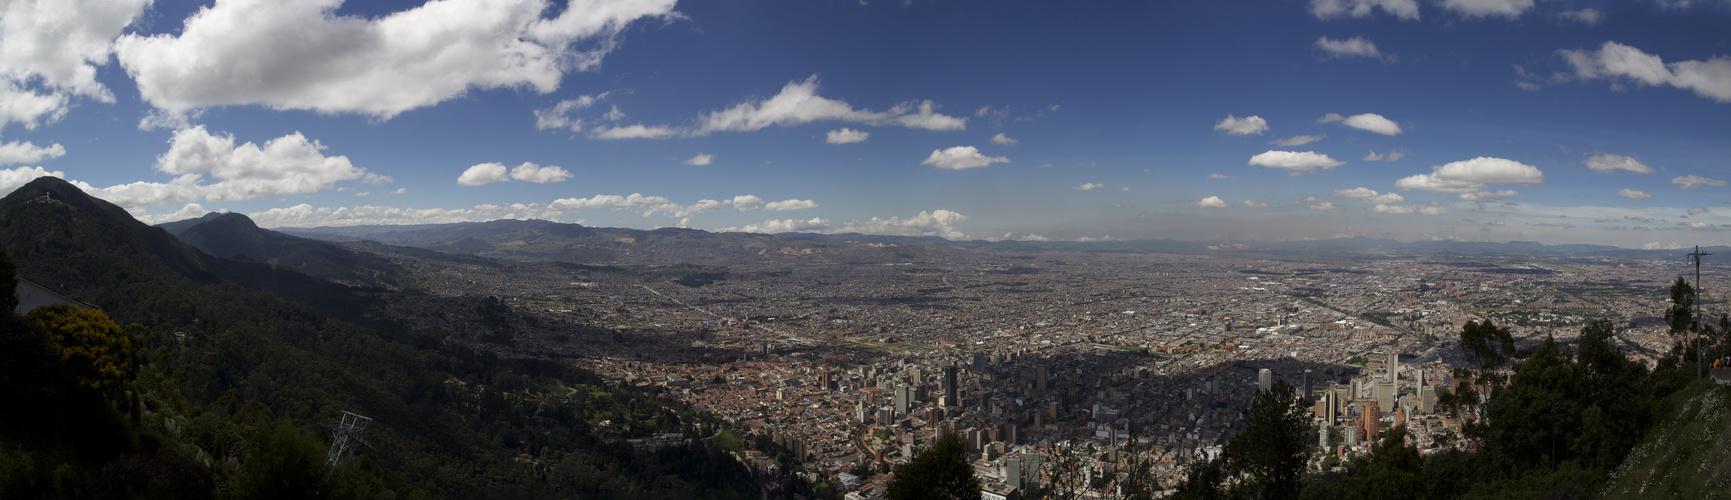 Monserrate de Bogotá